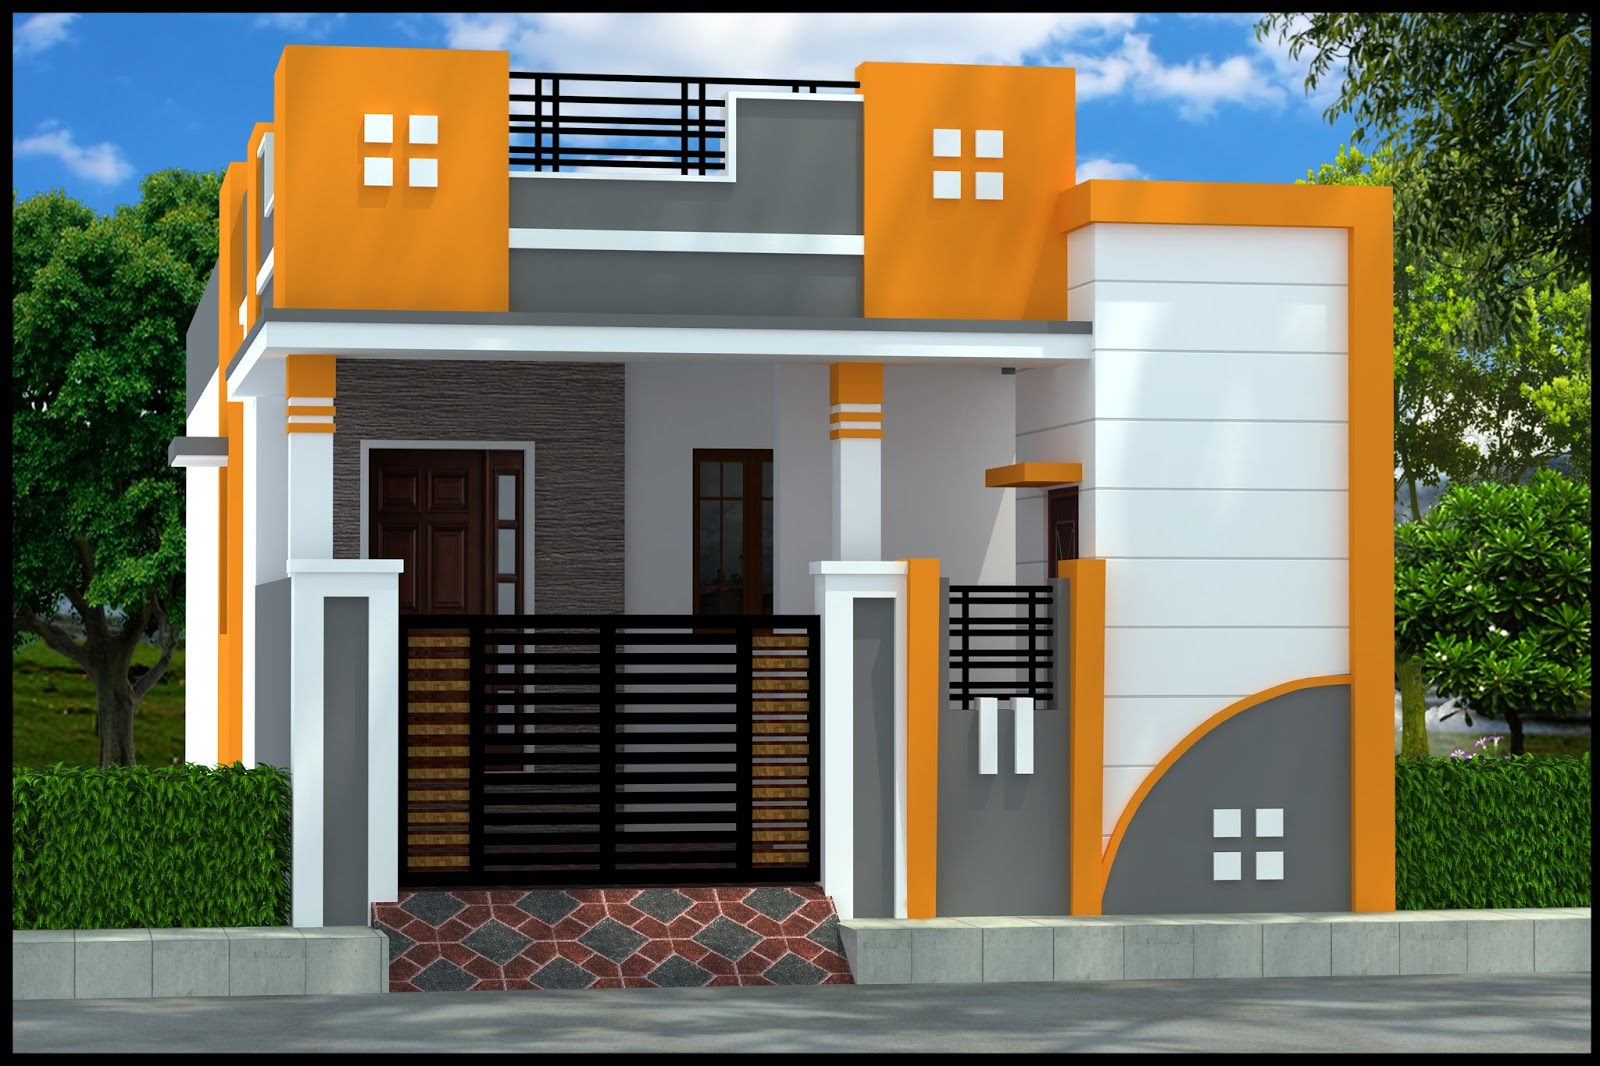 Interior design ideas for small homes in kerala fiifi samm fiifisamm on pinterest